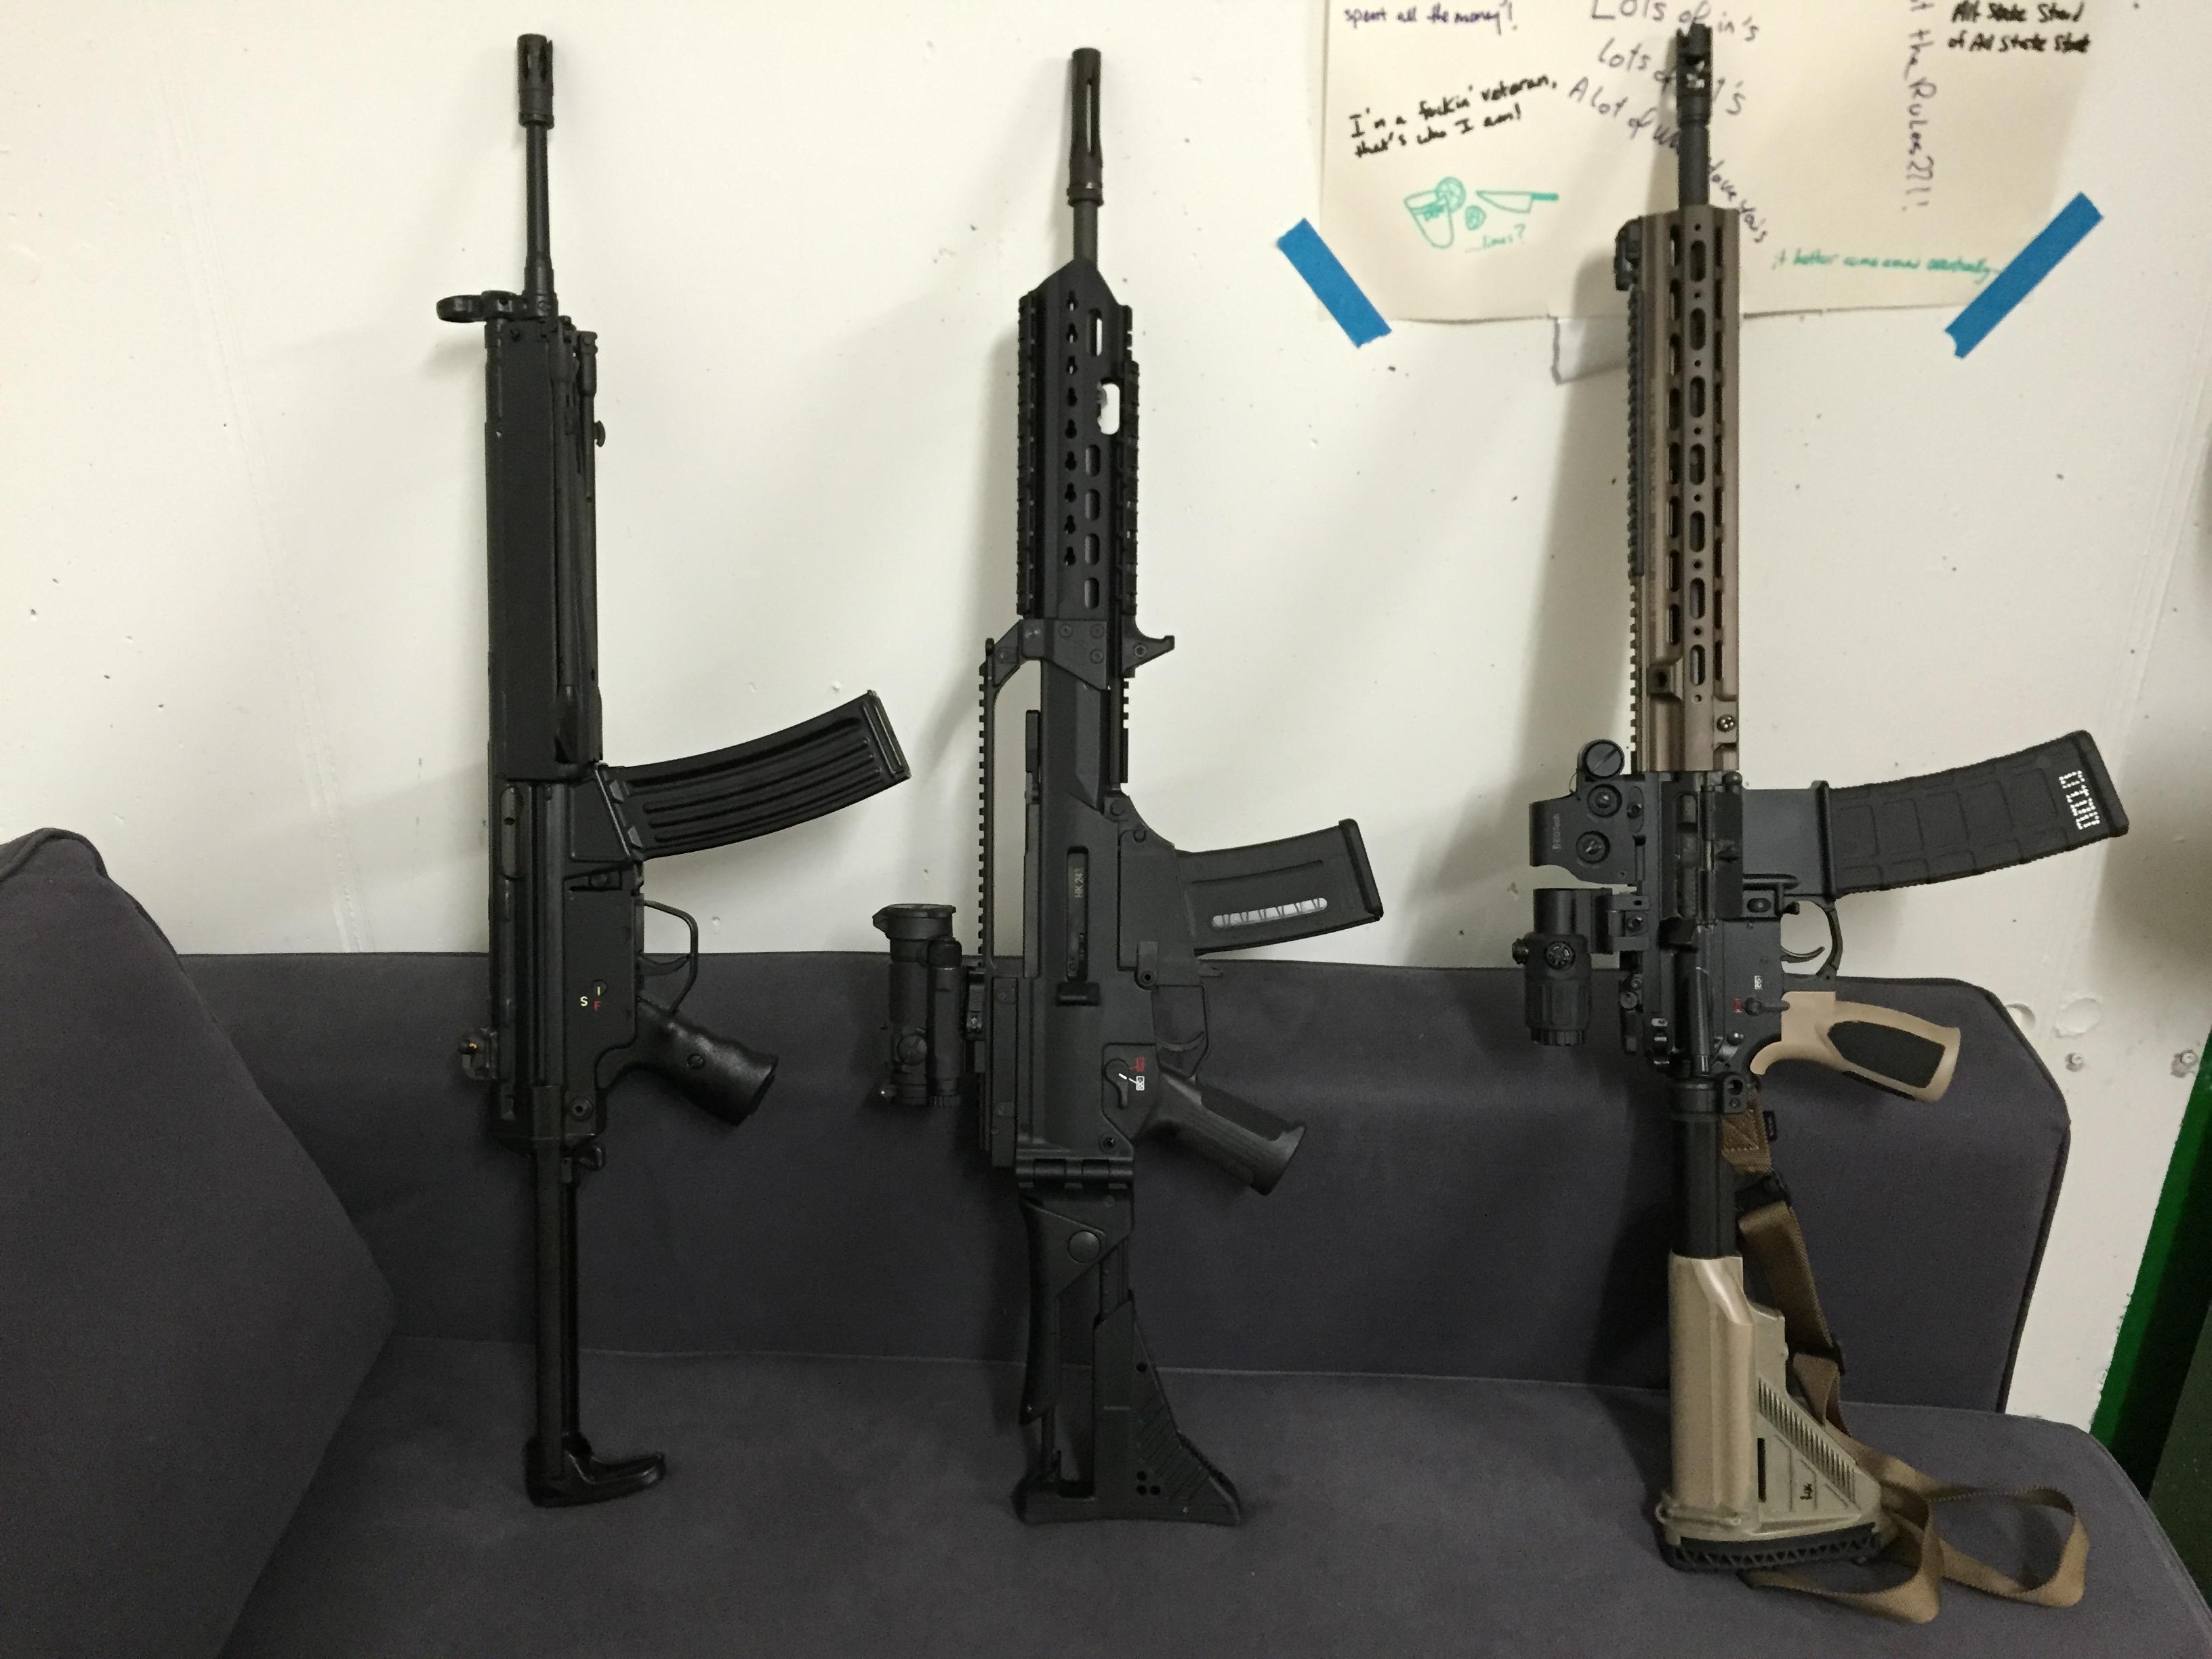 First impressions of my HK 243 S TAR-img_4675.jpg